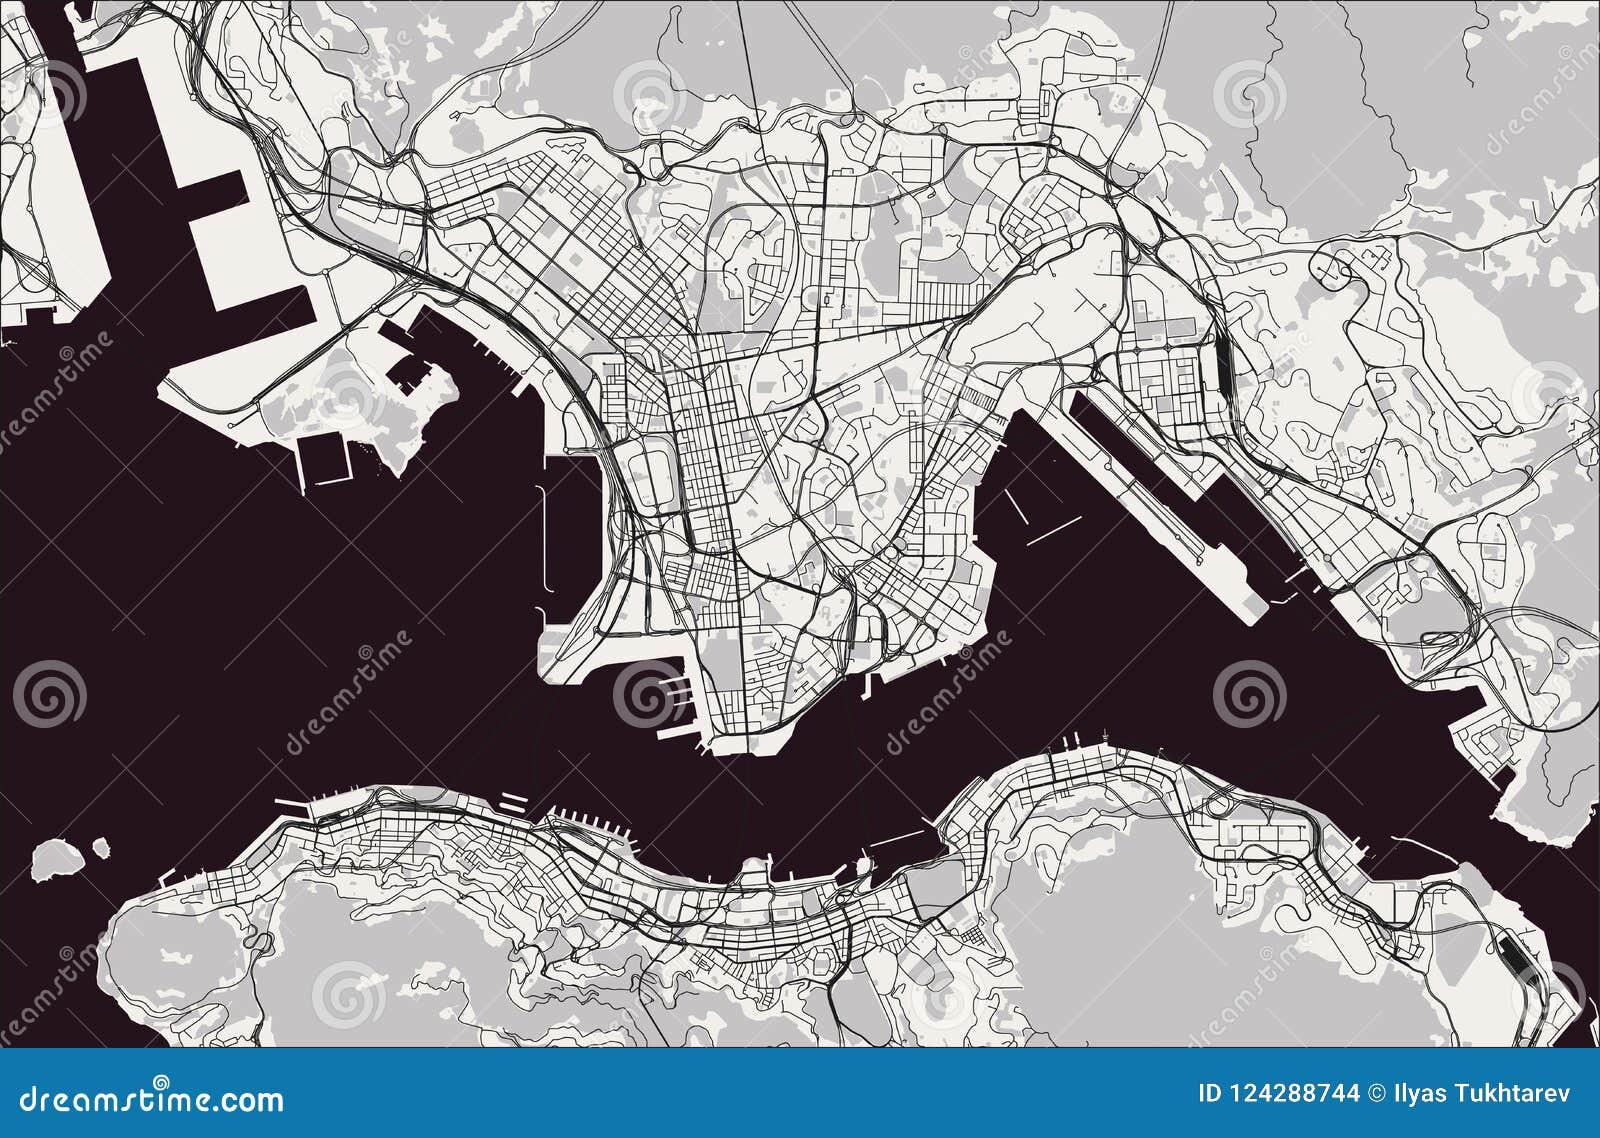 Karte China Hong Kong.Karte Der Stadt Von Hong Kong Sonderverwaltungszone Des Leute S